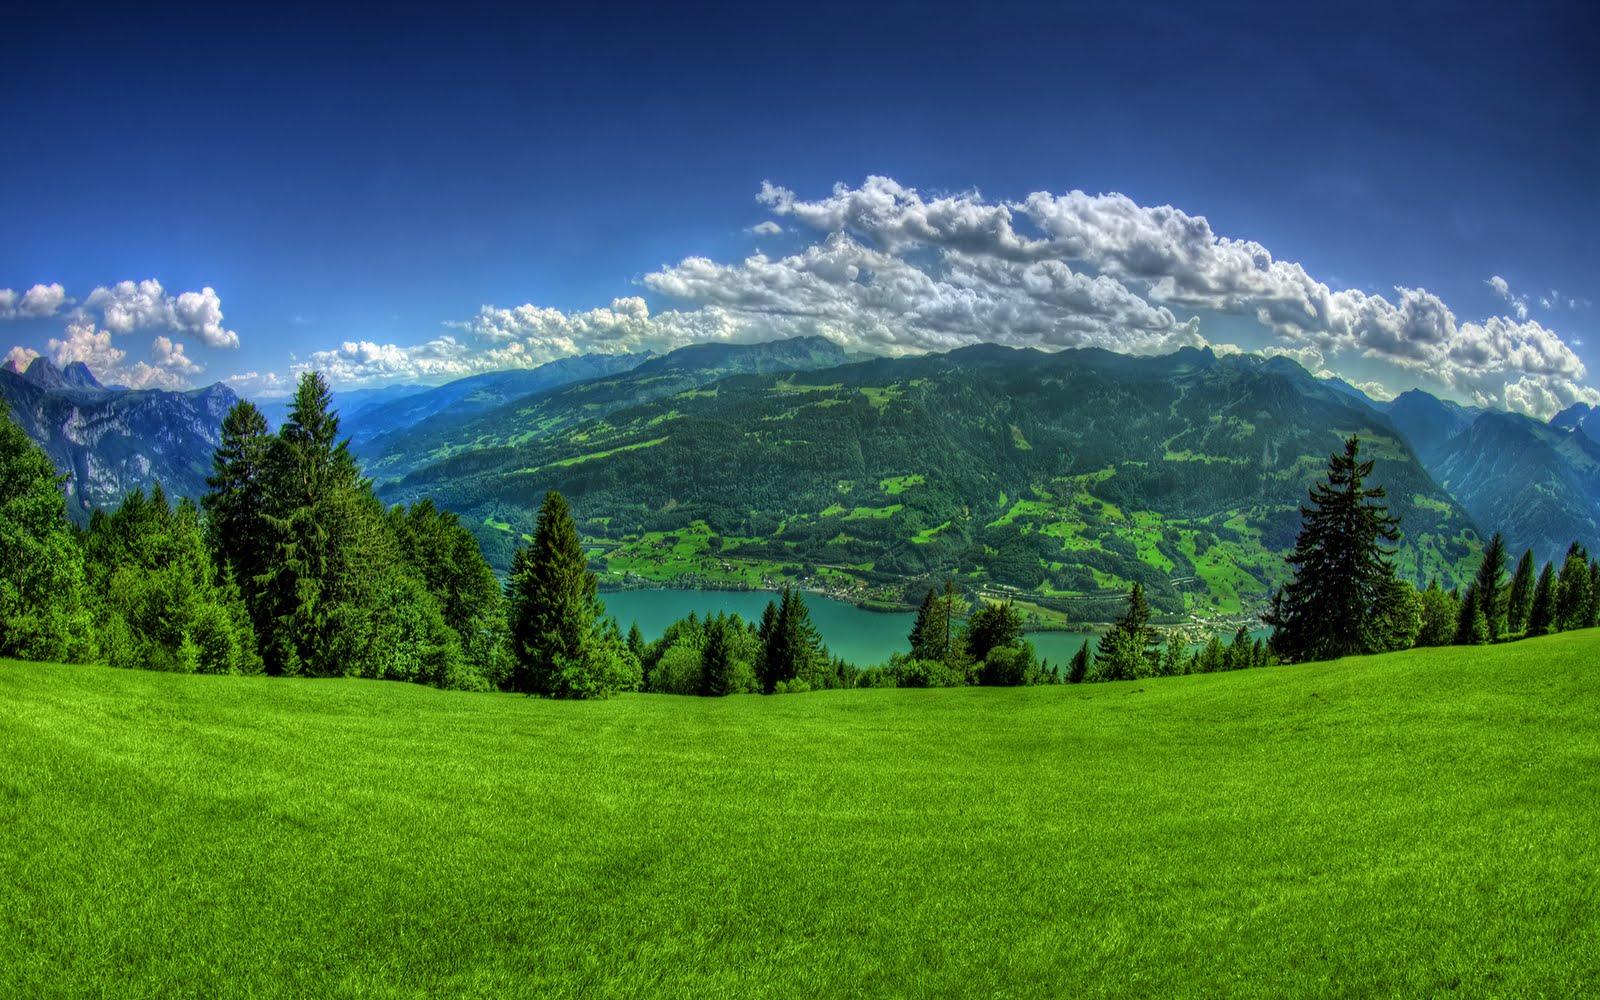 Fantastic Wallpaper Mountain Windows Vista - green+nature+images  Collection_4202.jpg